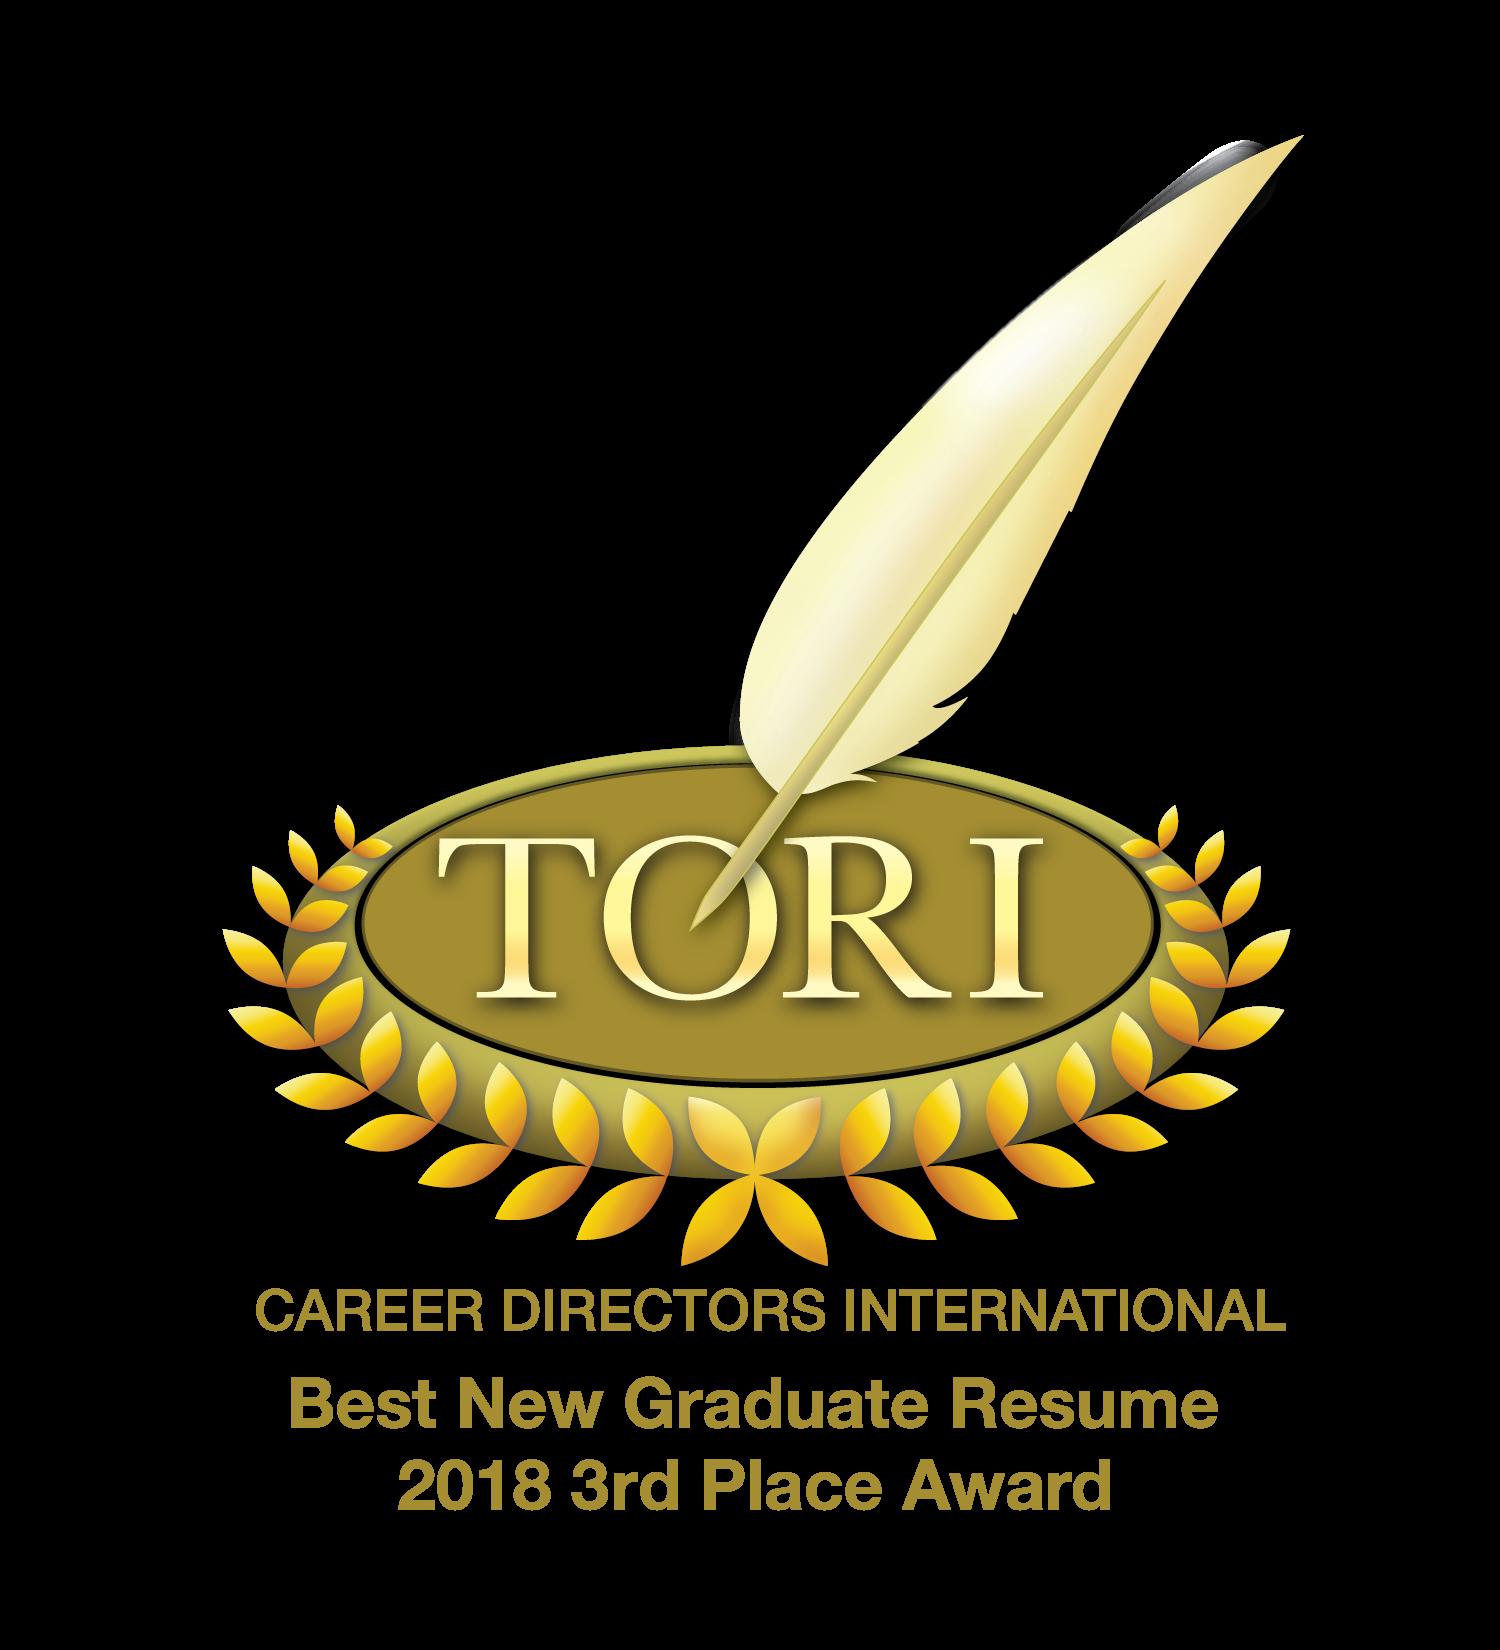 2019 TORI Award Winner!